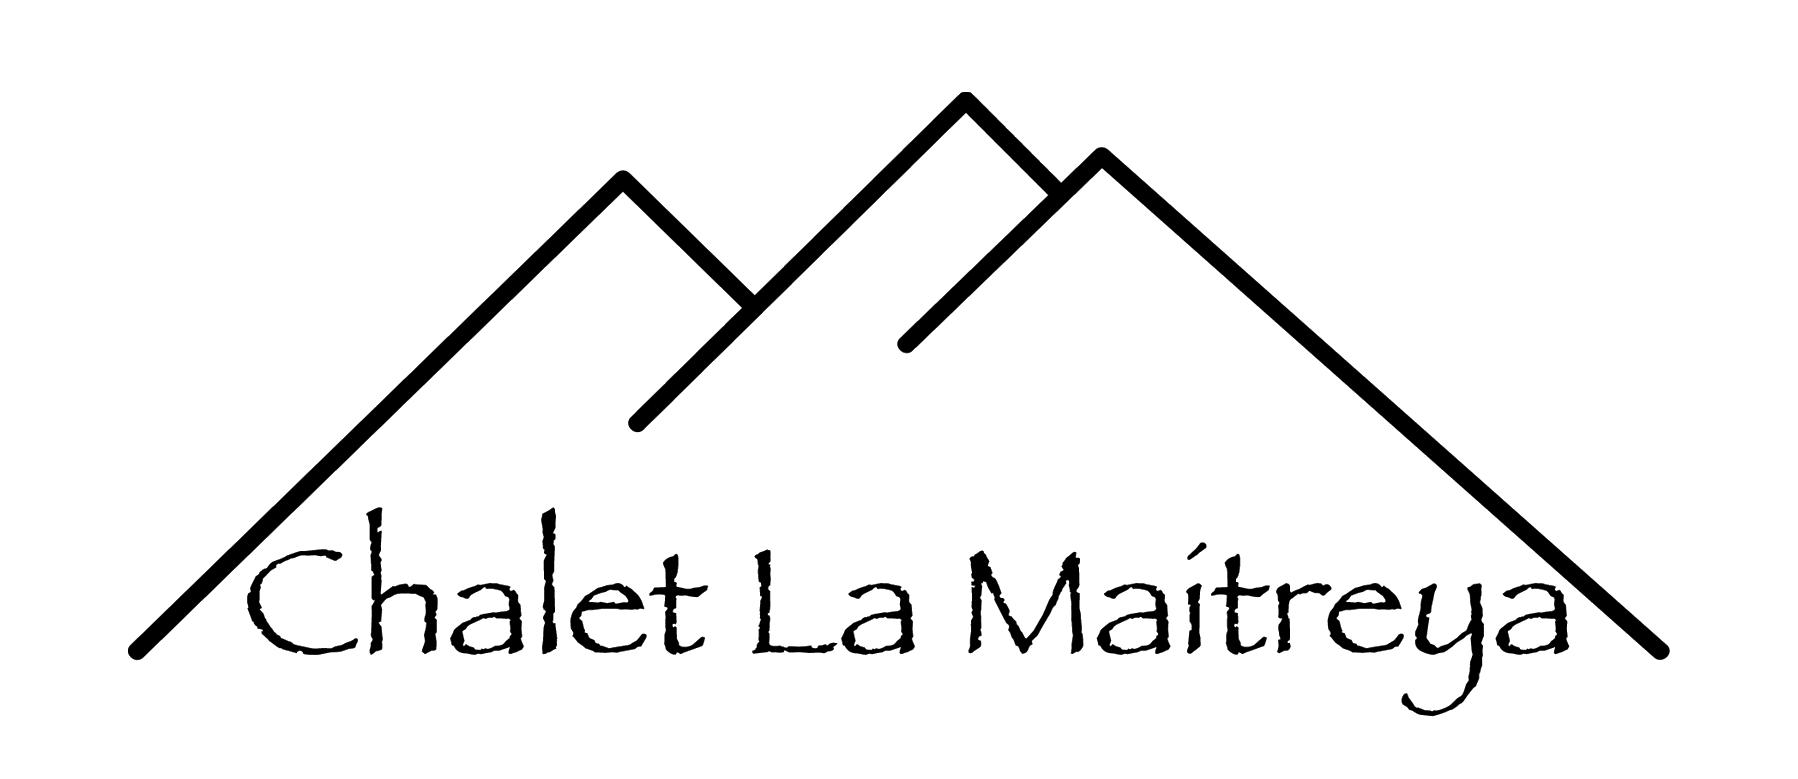 Chalet La Maitreya